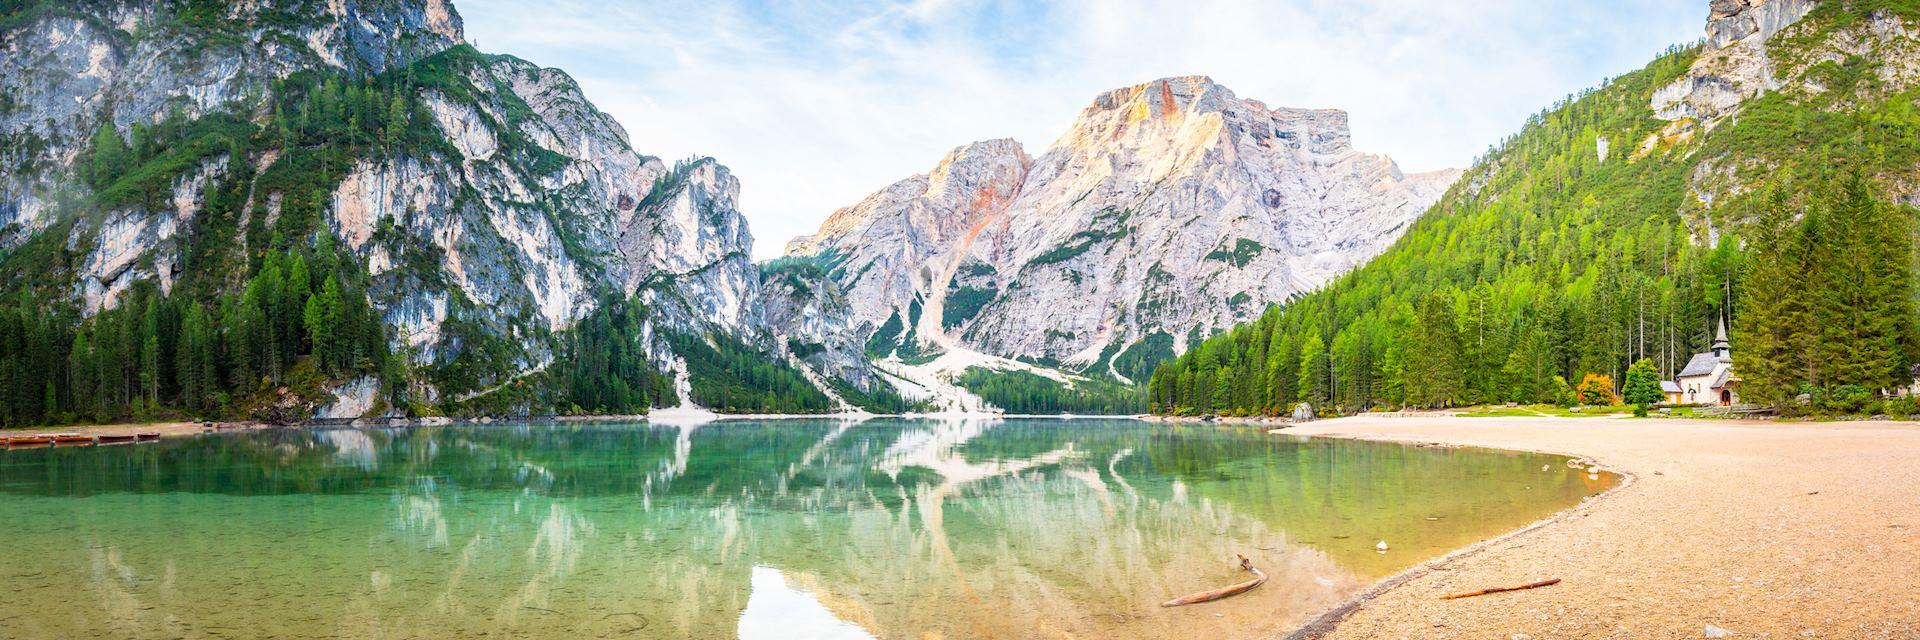 Lago di Braies lake in the Italian Dolomites